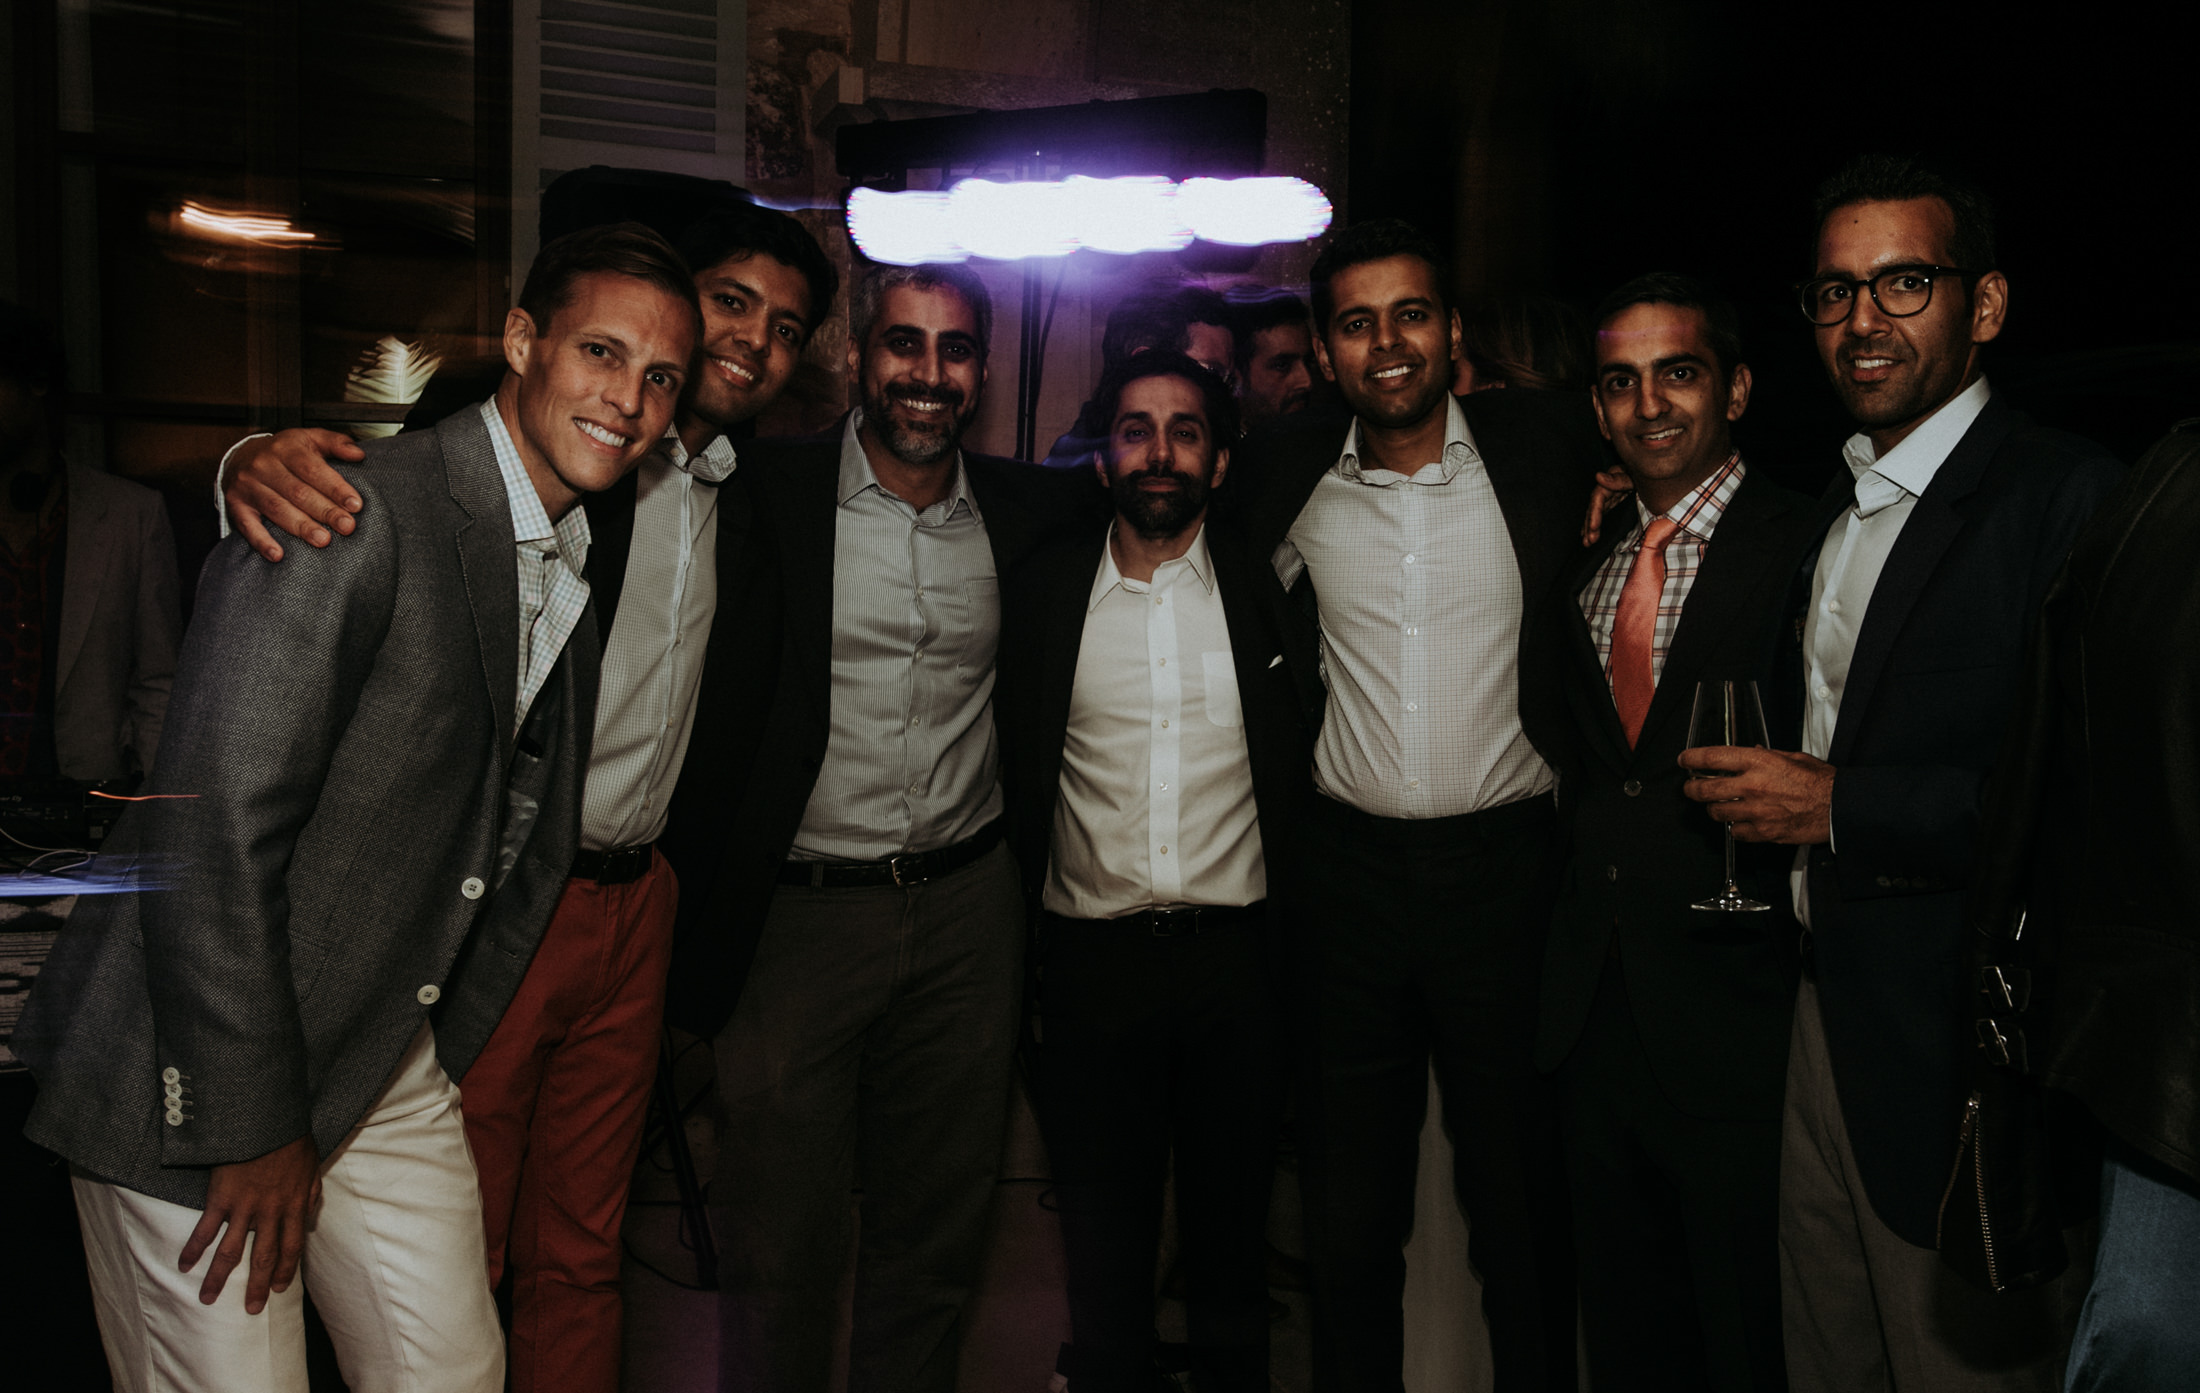 Wedding_Photographer_Mallorca_Daniela-Marquardt_Photography_New_York_Iceland_Tuscany_Santorini_Portugal_Austria_Bavaria_Elopement_Hochzeitsfotograf_AntjeRajat1_61